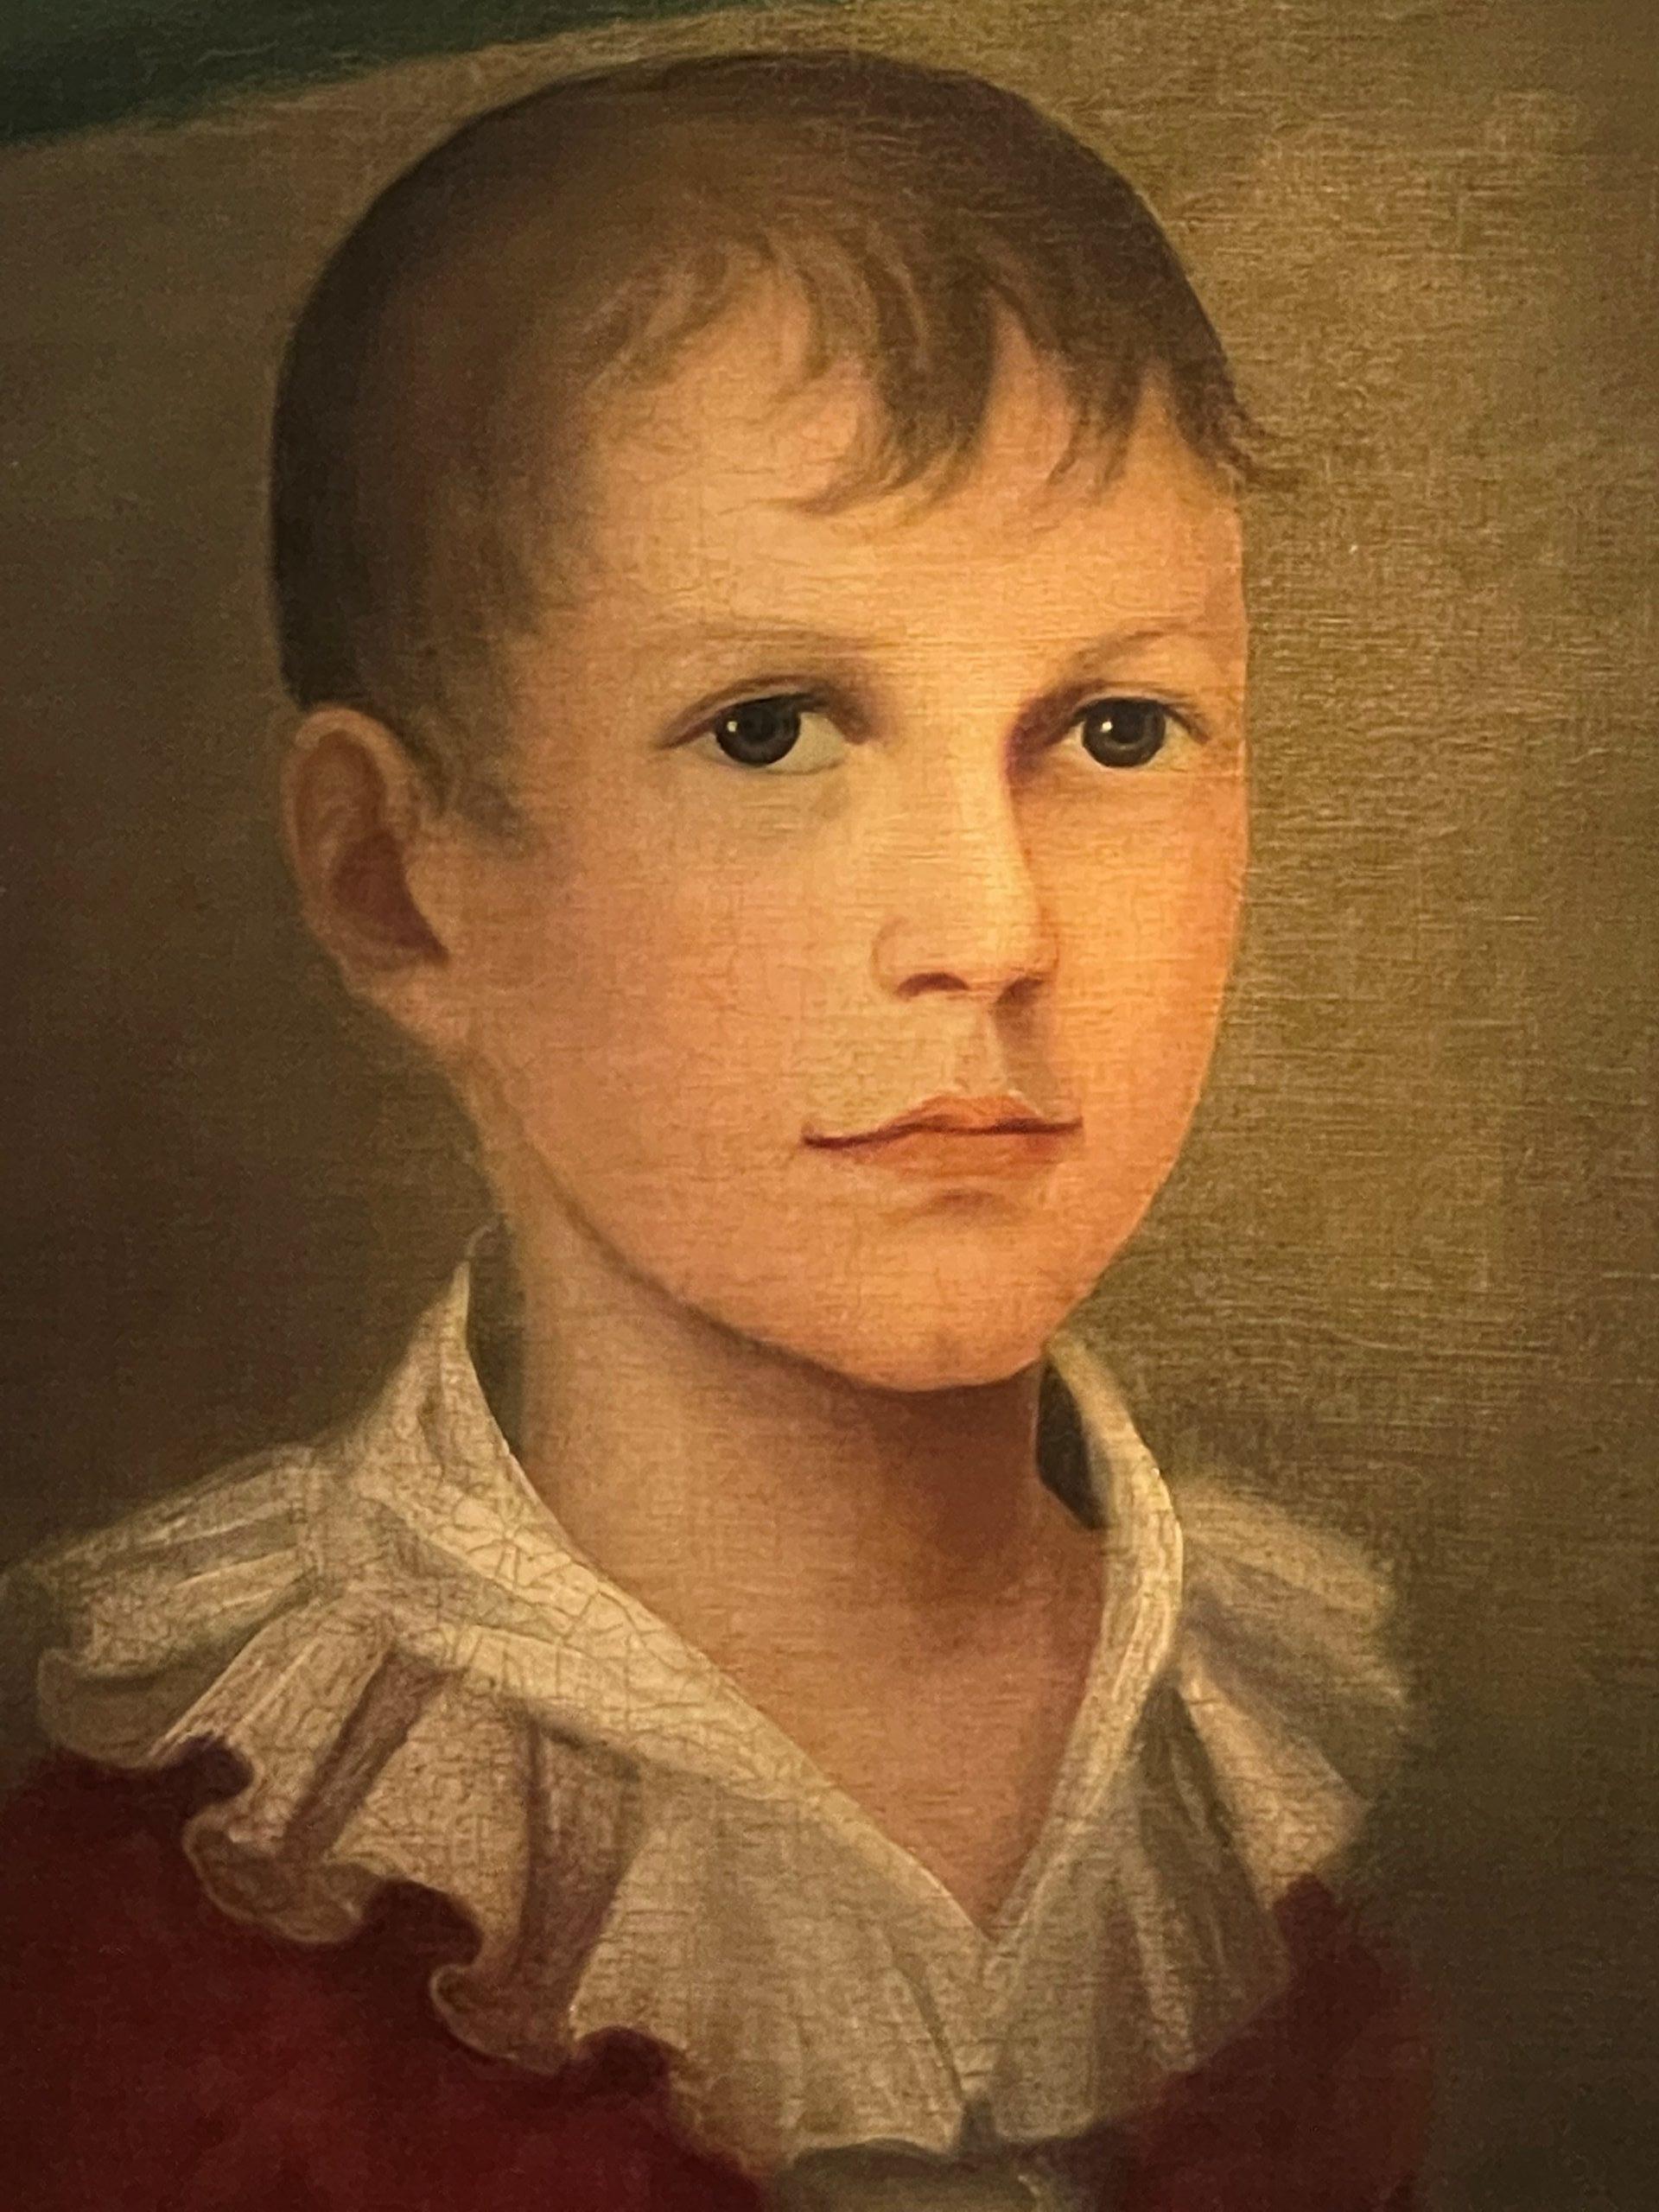 ammi phillips portrait boy rel=